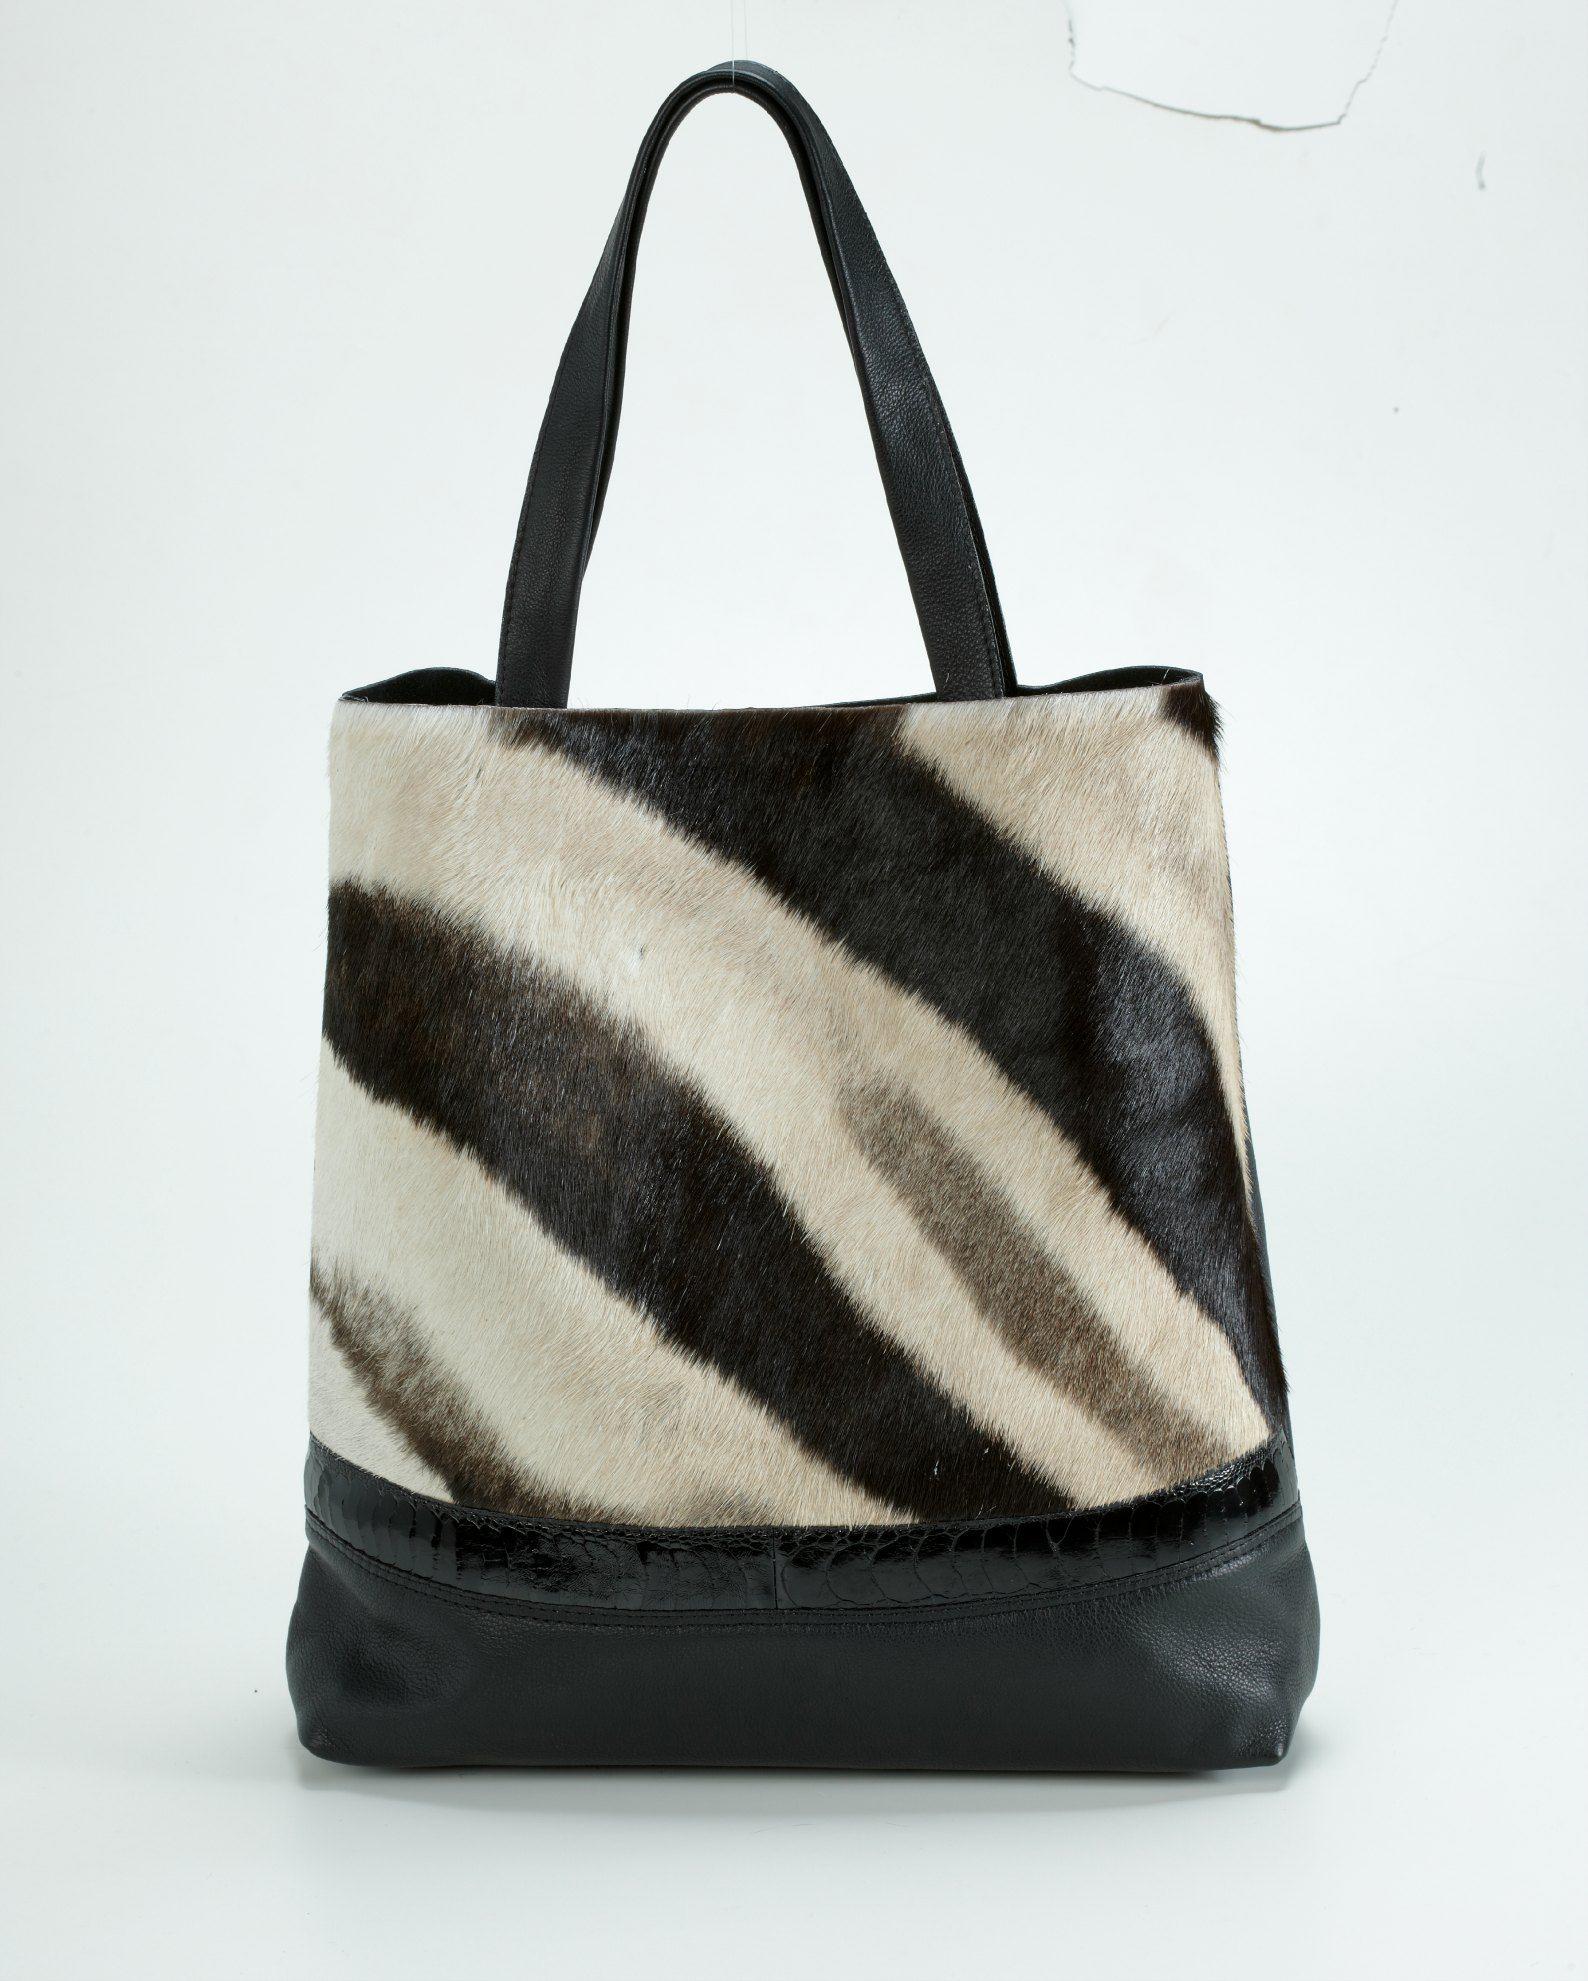 Zebra Skin Handbag Luxury Leather Bags  94921b7d31466